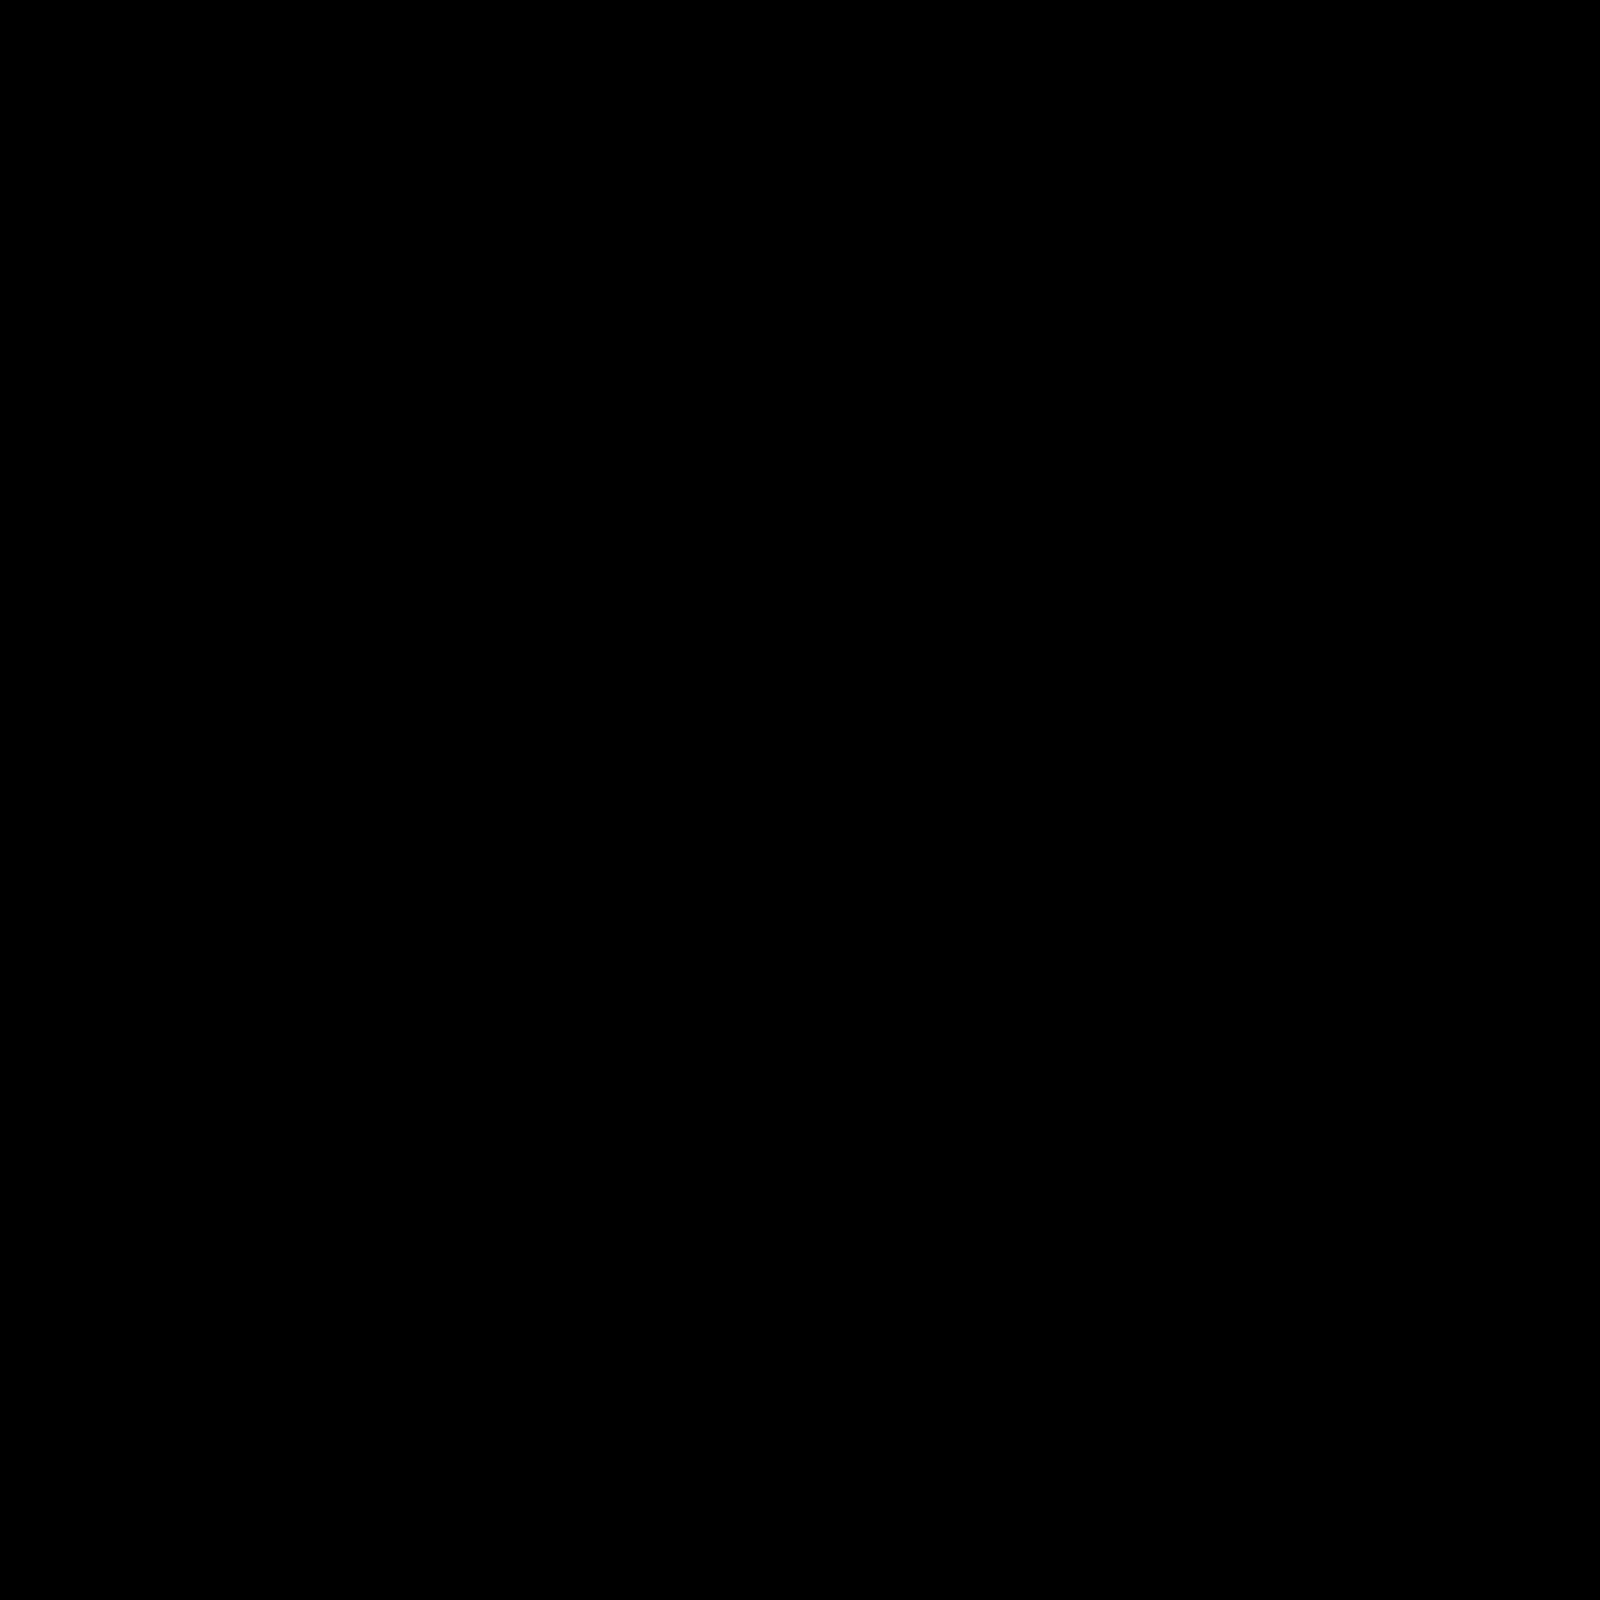 Fourth Wave icon